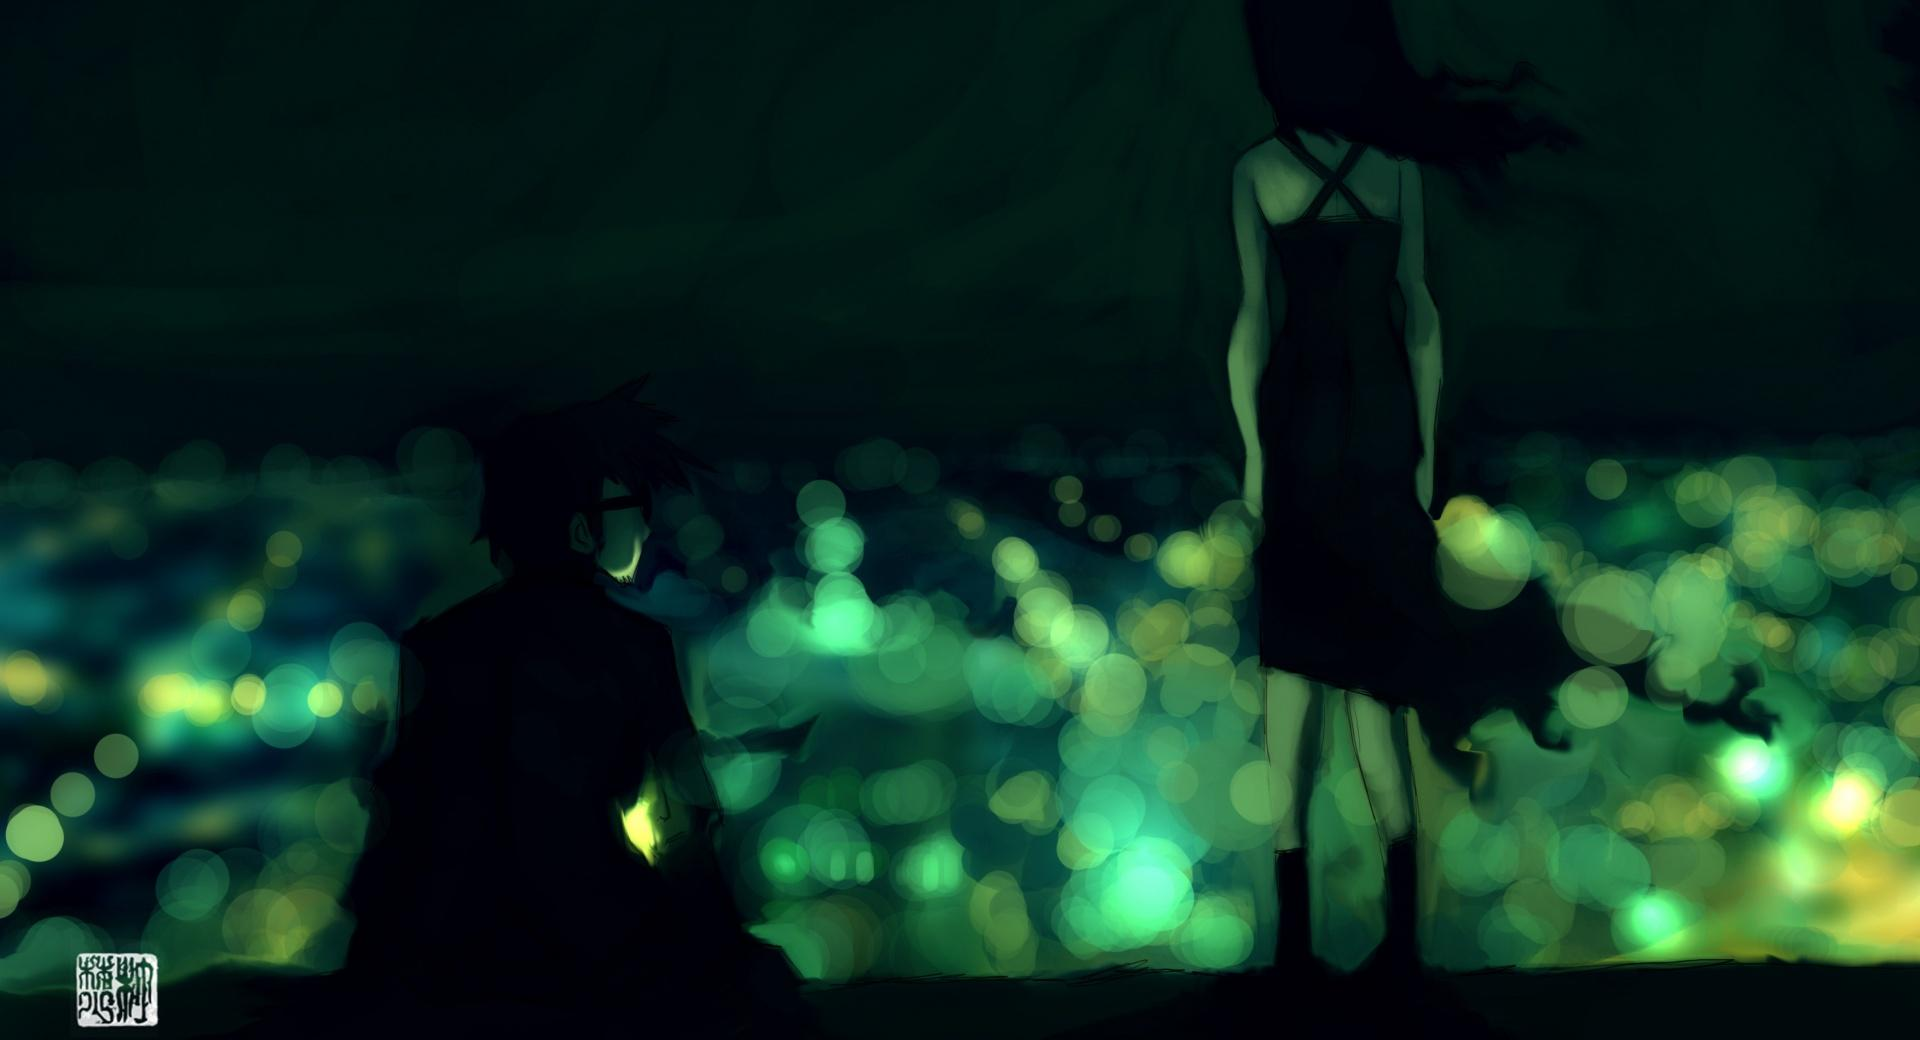 Girl And Boy Anime wallpapers HD quality